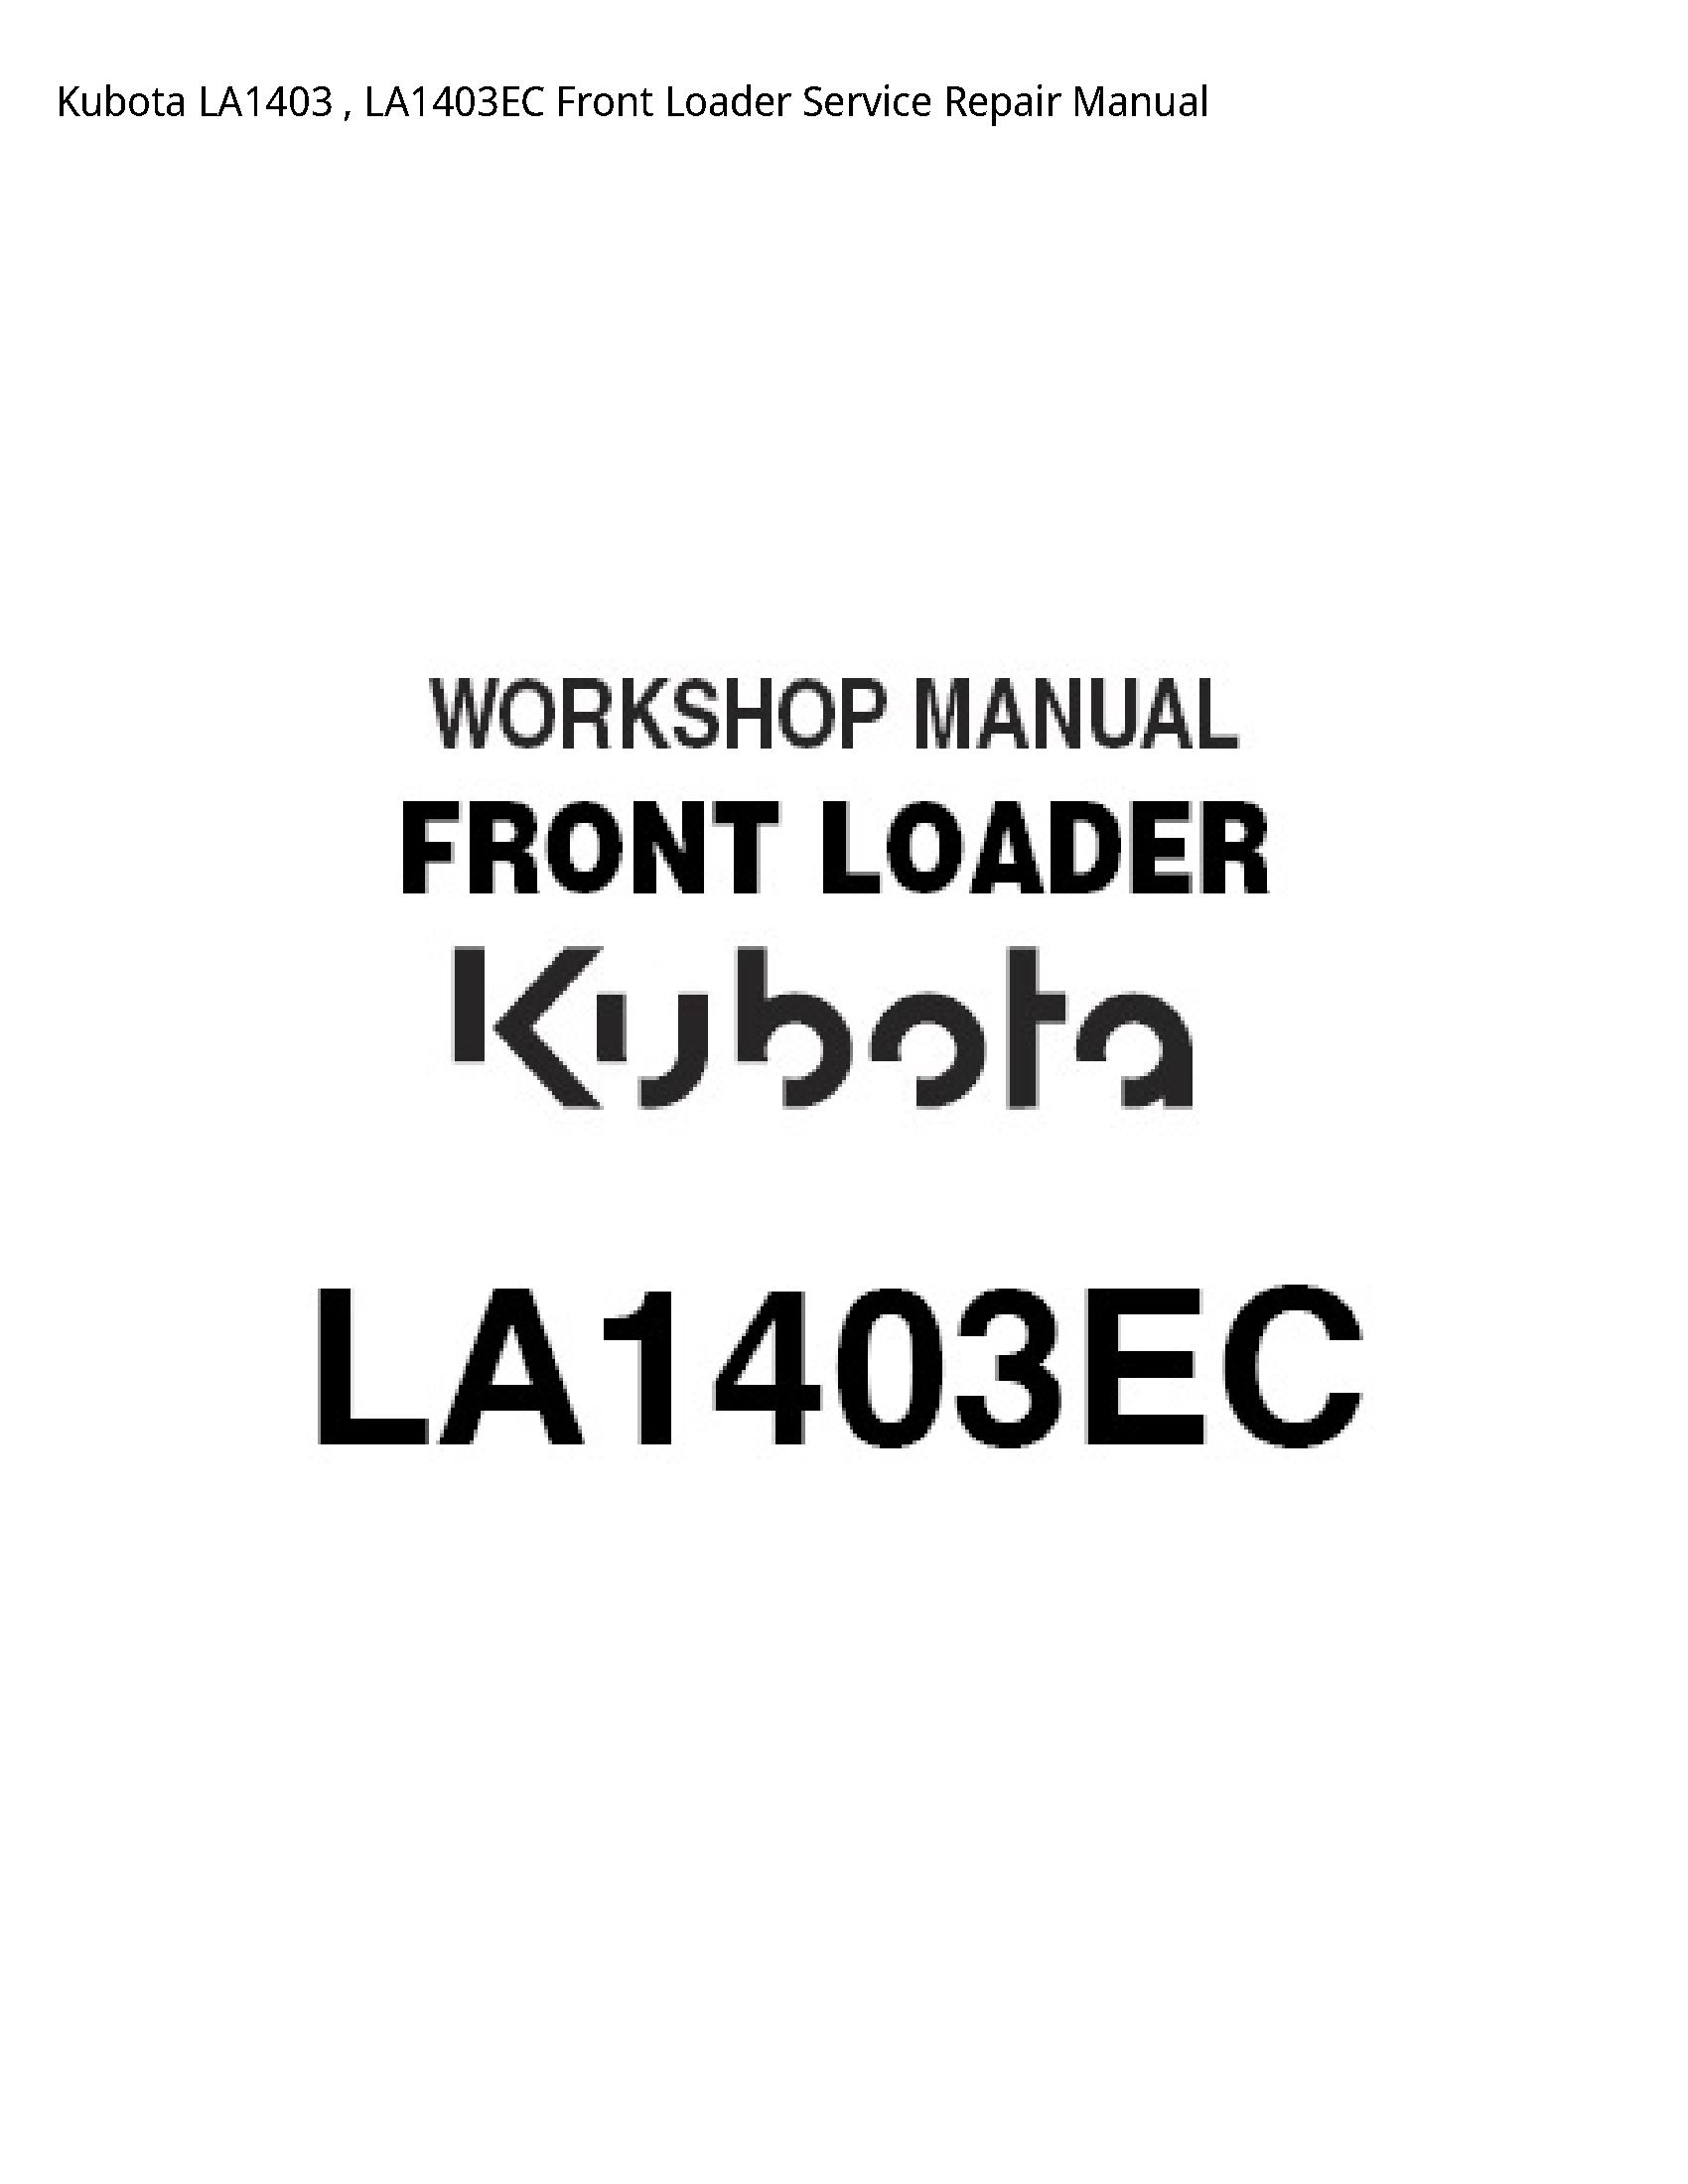 Kubota LA1403 Front Loader manual